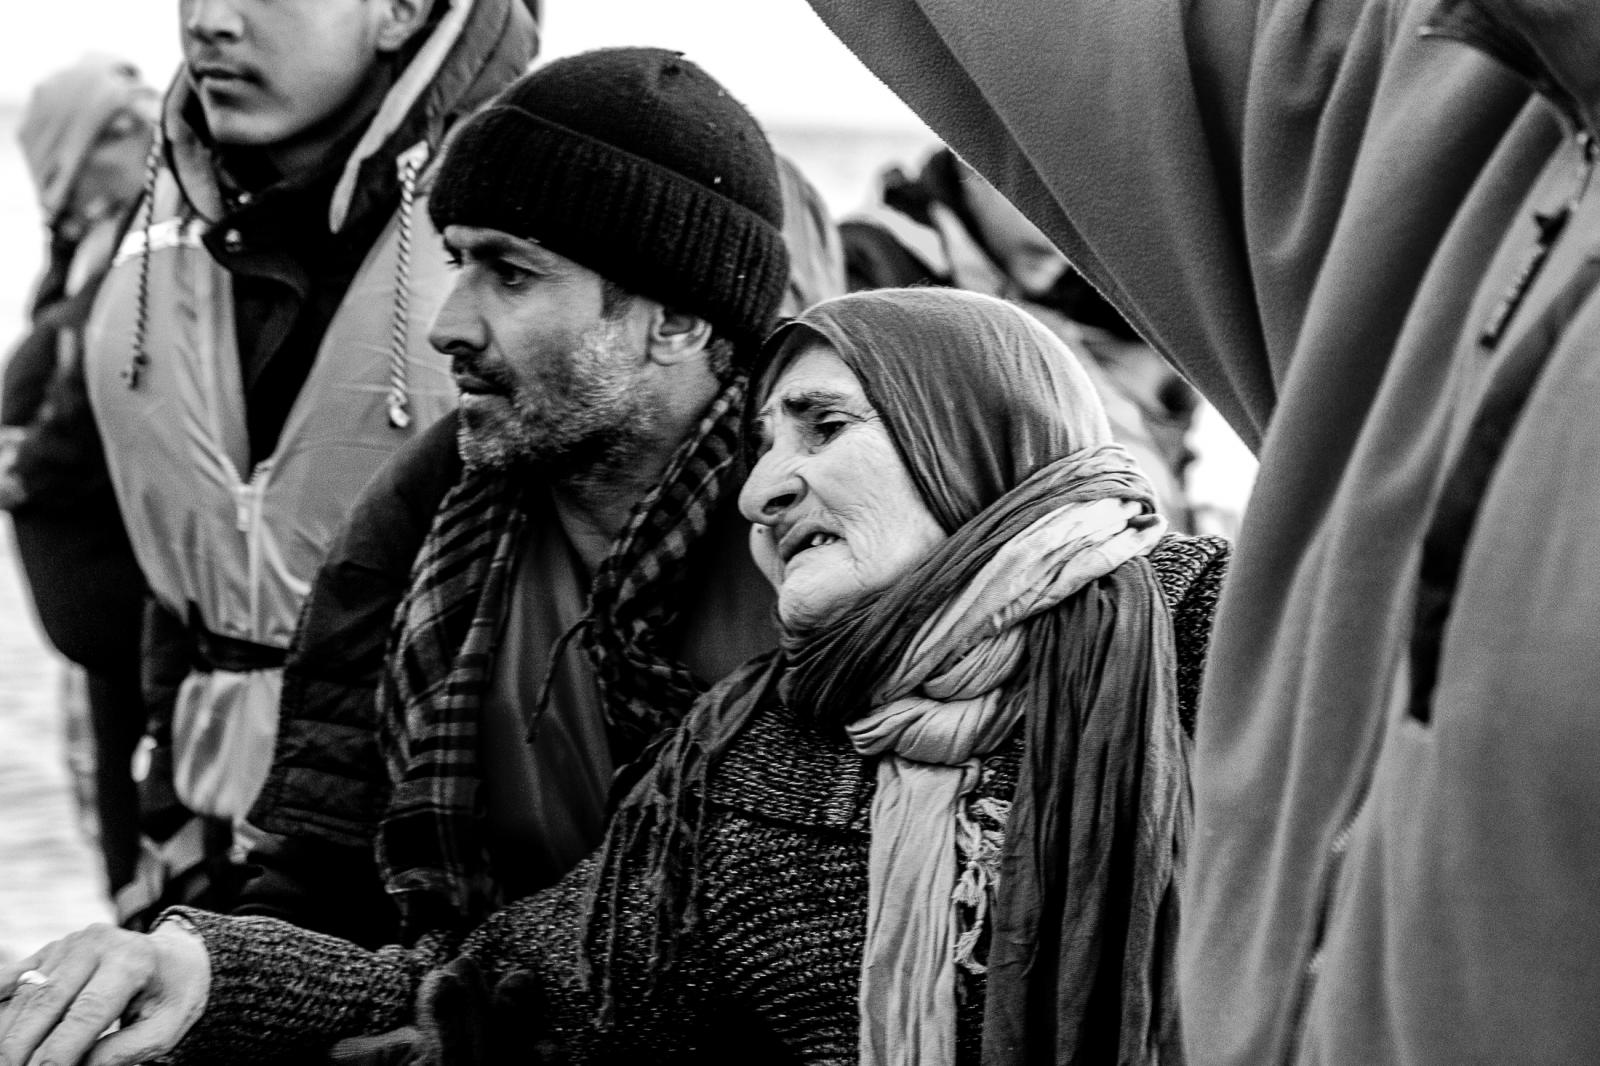 Photography image - Loading 003_Refugee-Crisis-Greece-Omar-Havana.jpg